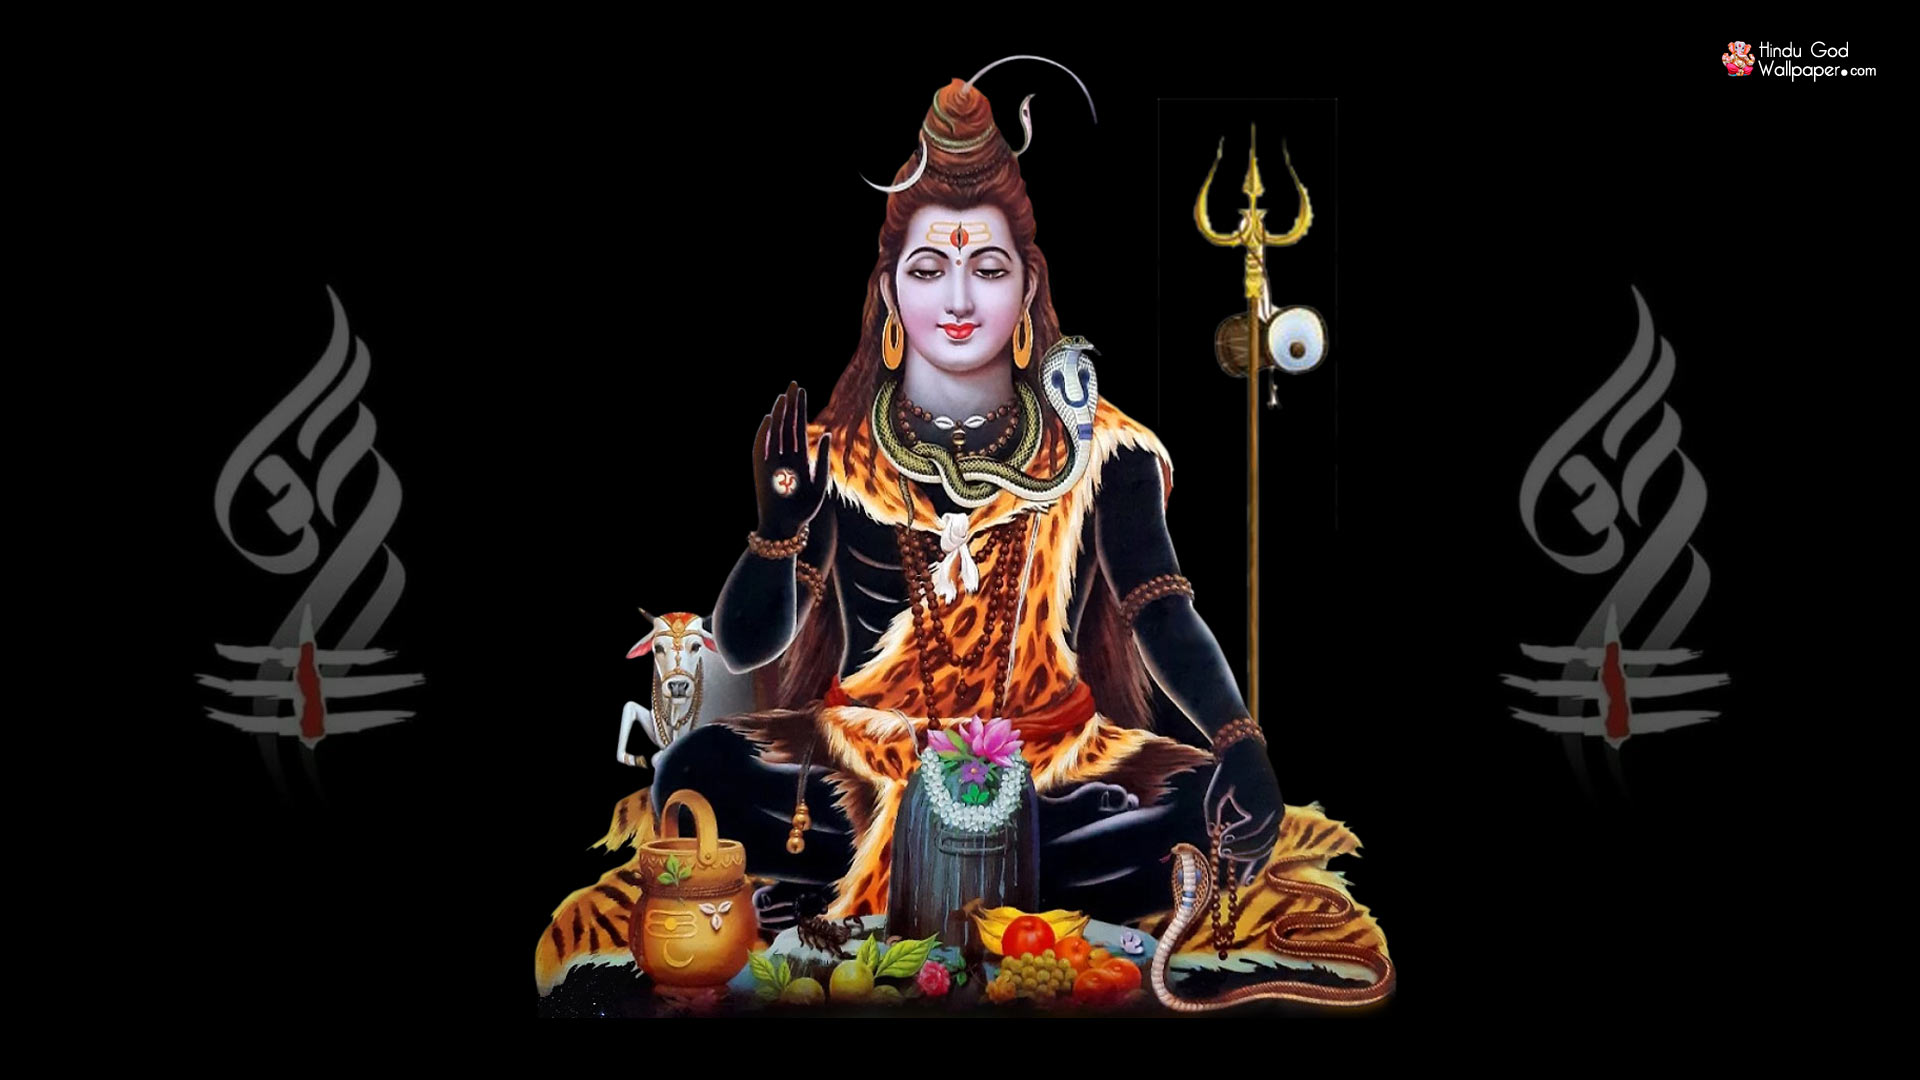 1080p lord shiva black hd wallpapers 1920x1080 free download 1080p lord shiva black hd wallpapers